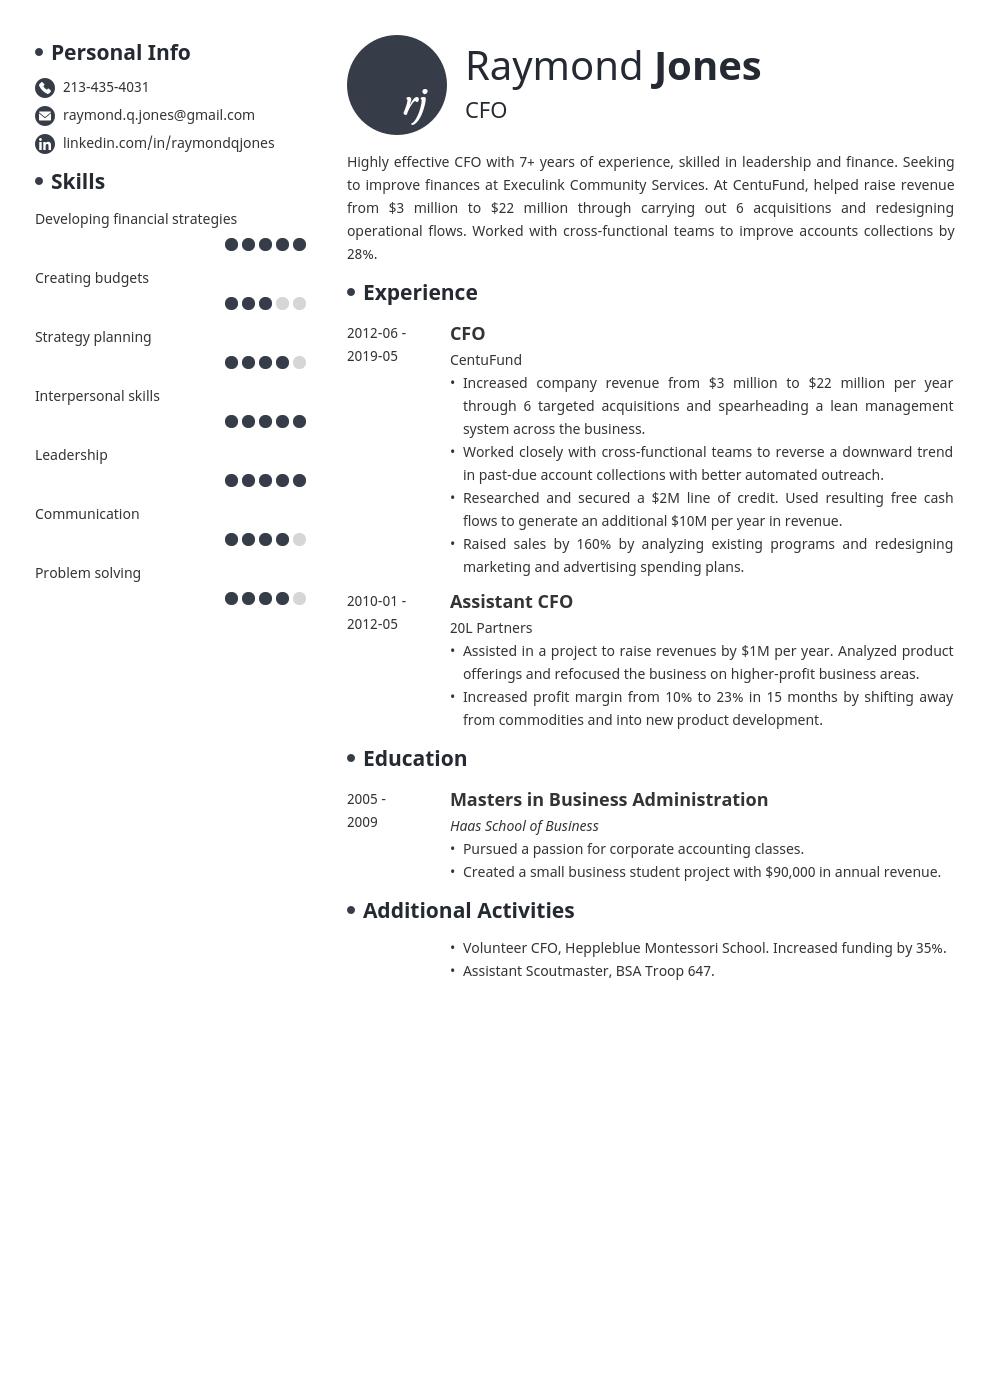 cfo resume example template initials in 2020 Resume